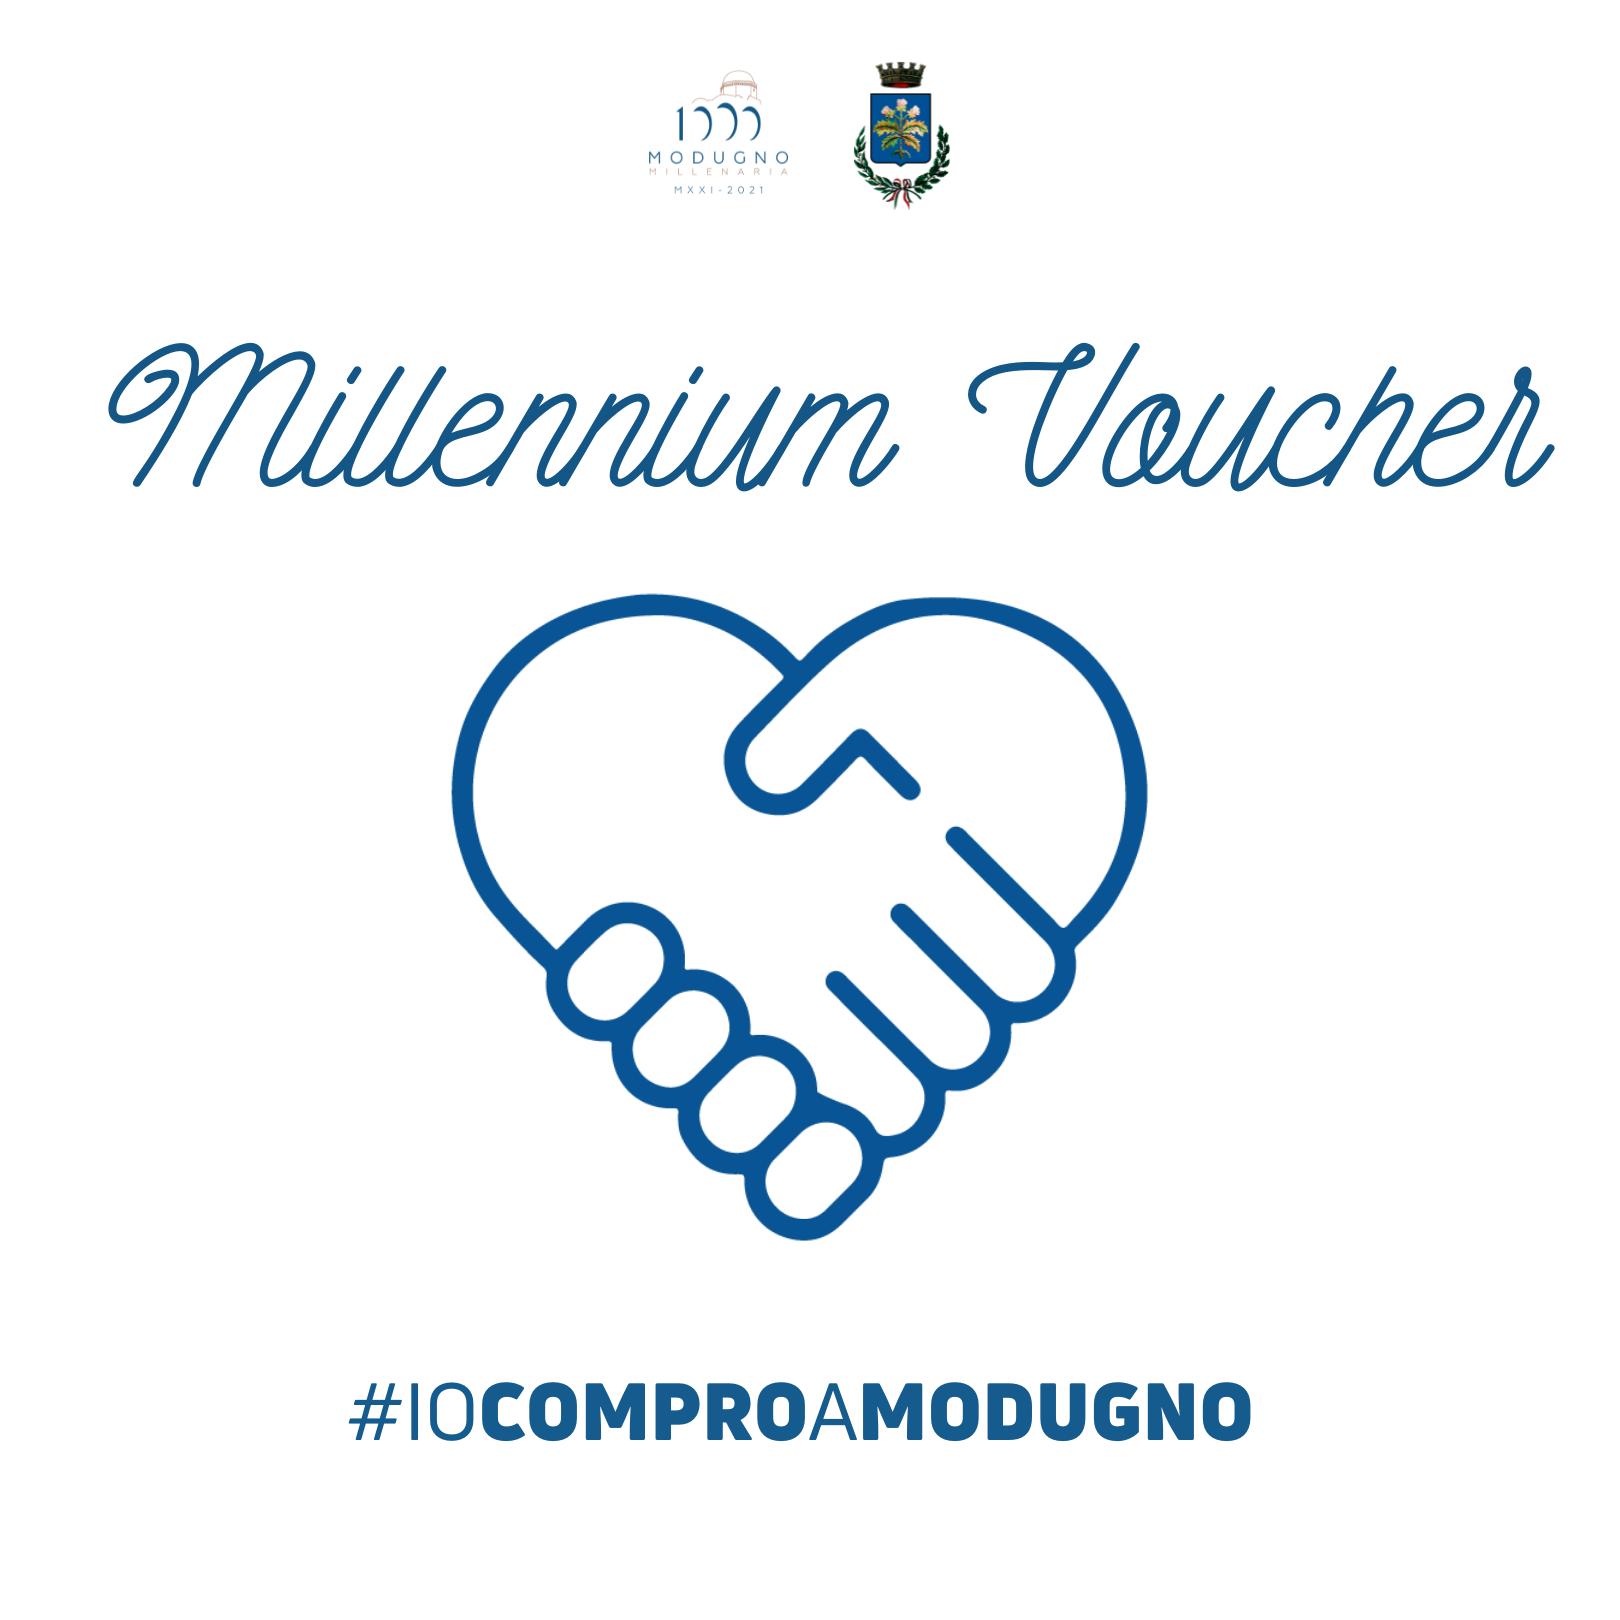 Iniziativa  'Millennium Voucher' – #iocomproamodugno